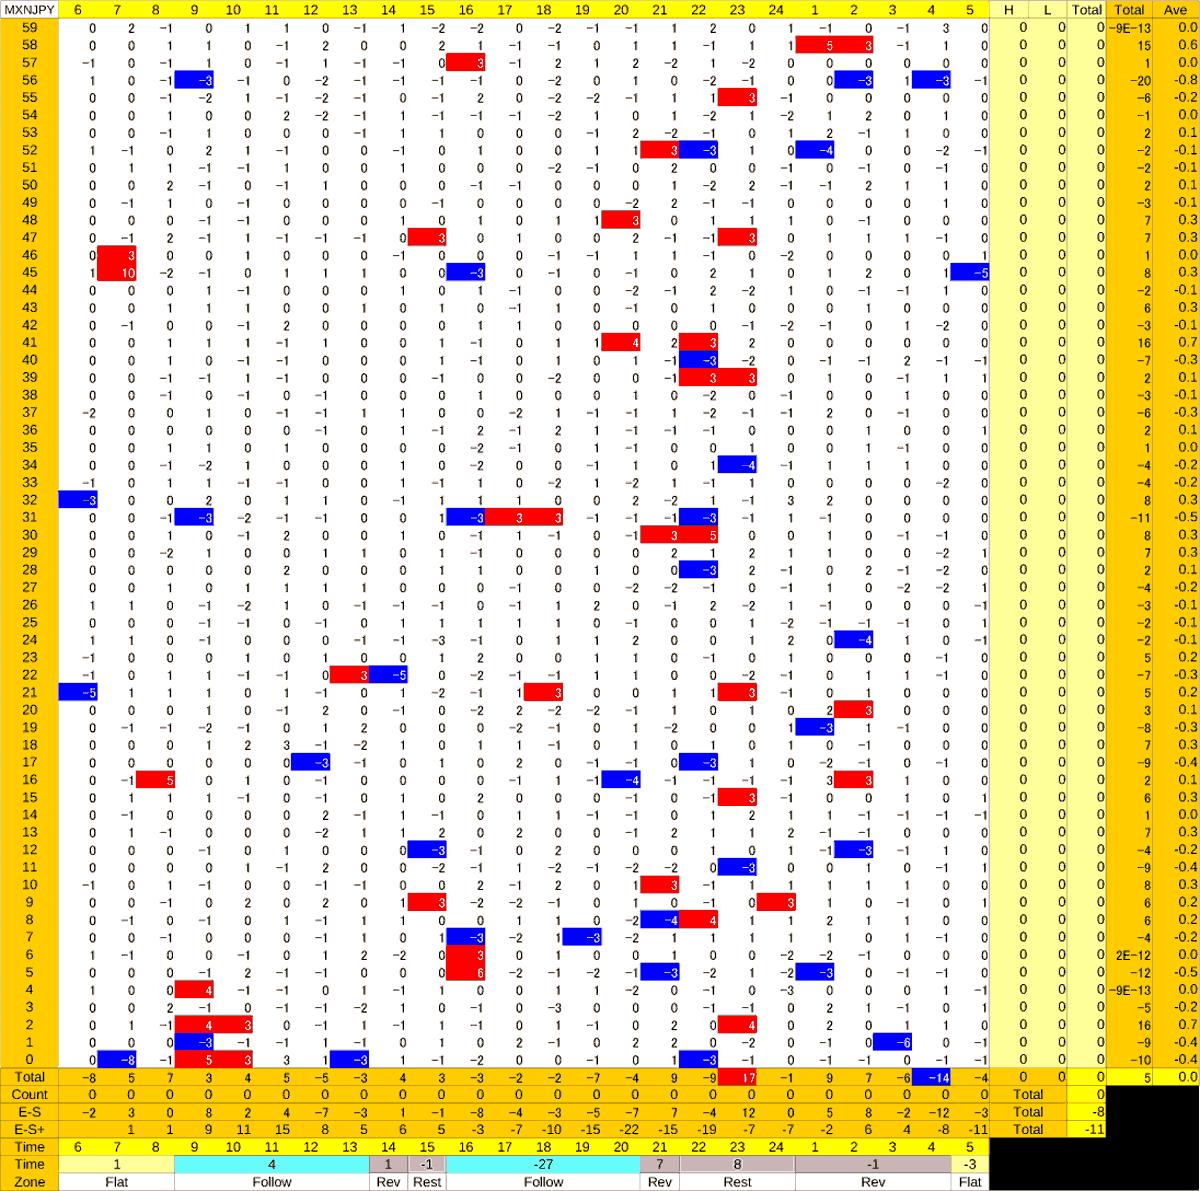 20200728_HS(3)MXNJPY